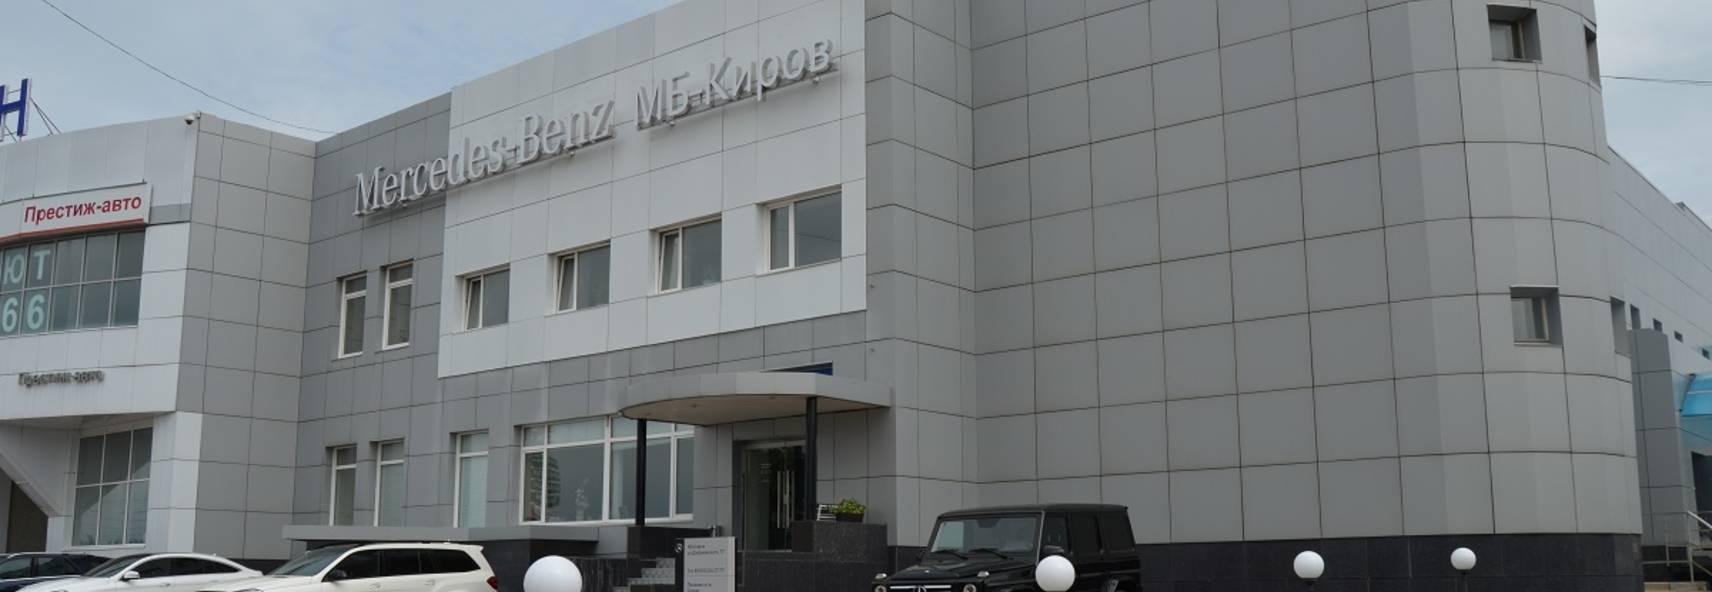 Престиж-авто Mercedes-Benz